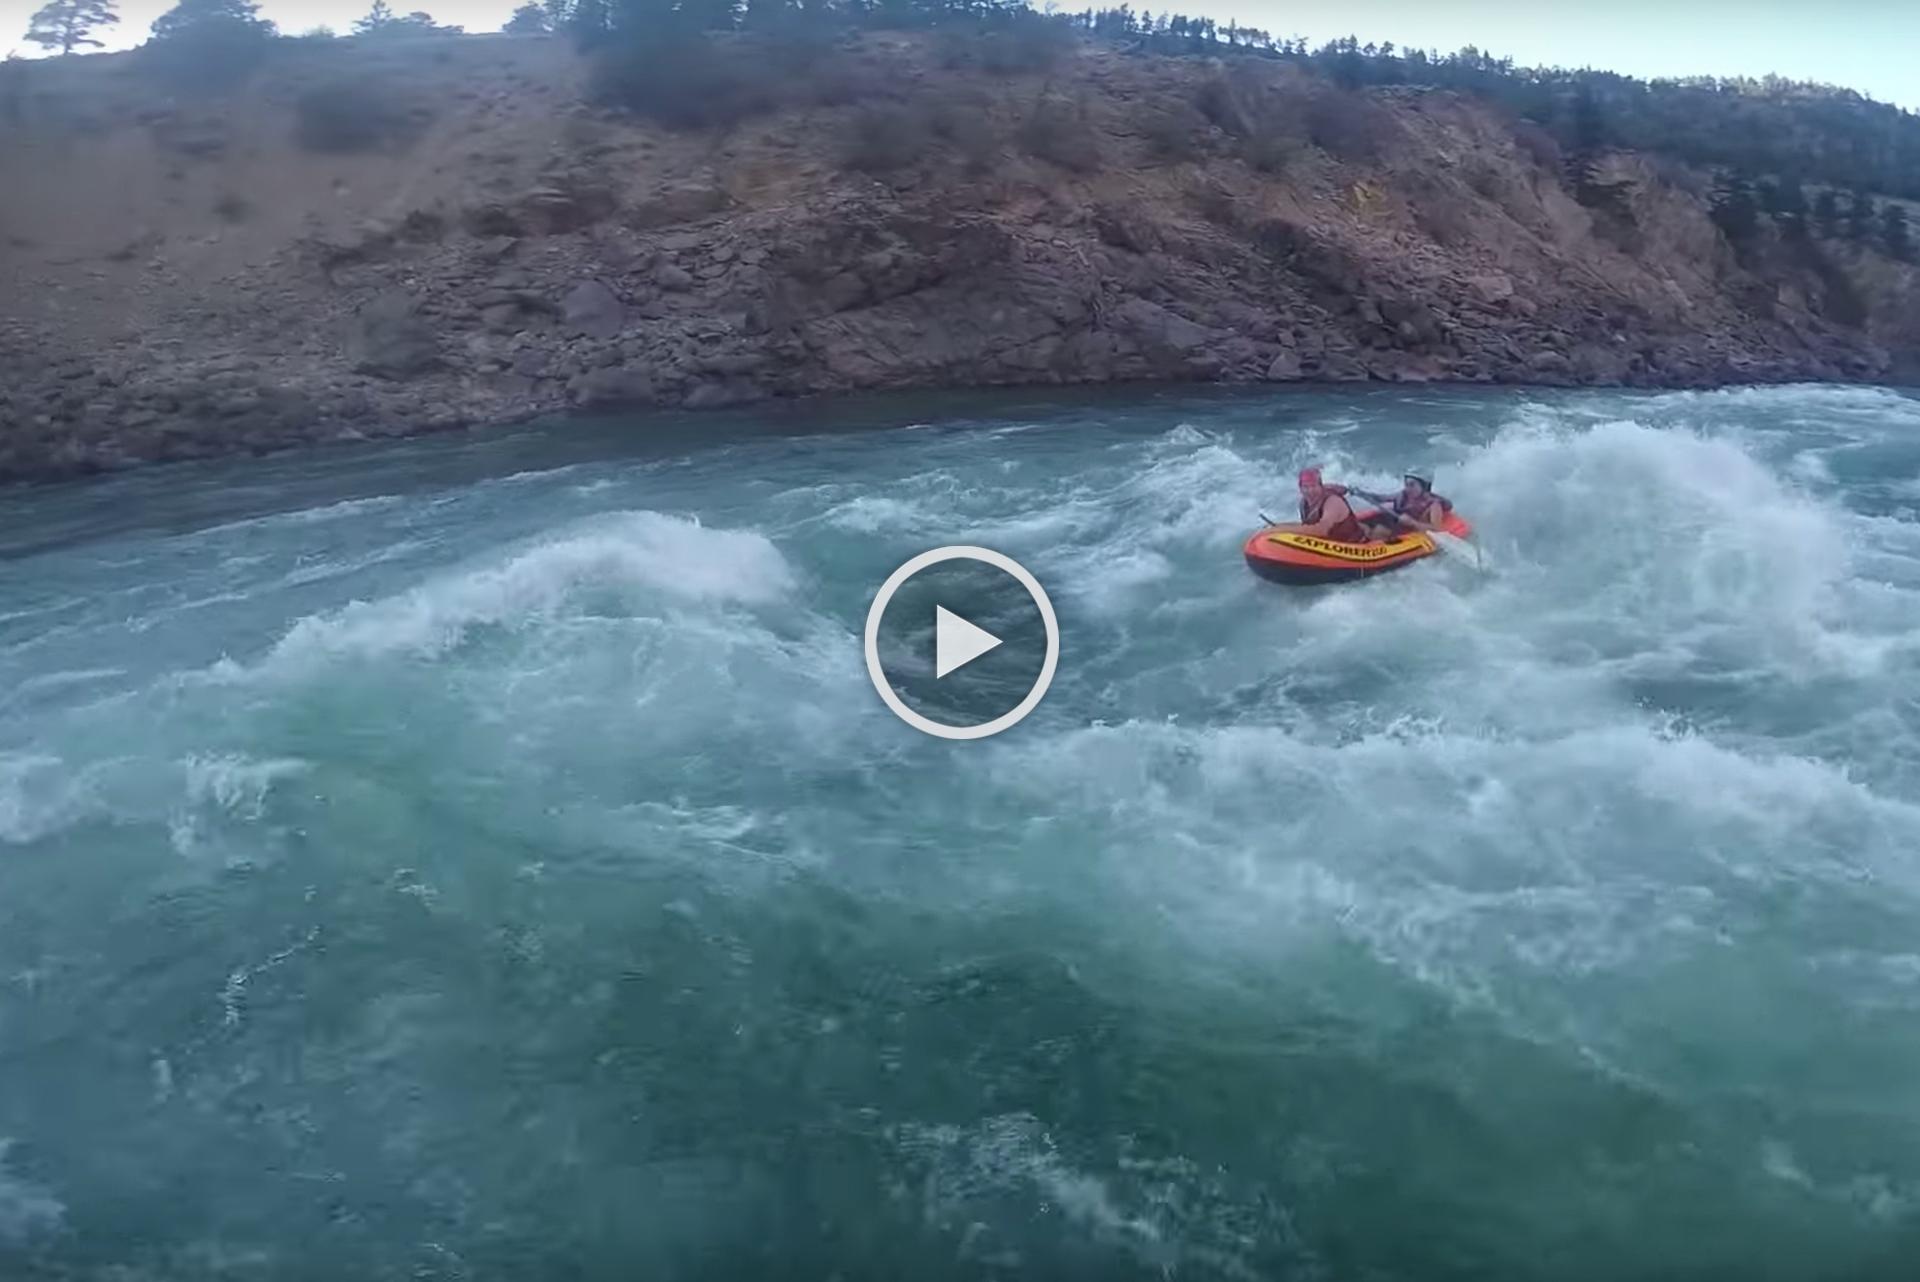 Best Raft Fails: Intex Explorer 200 vs  Rapids | Paddling